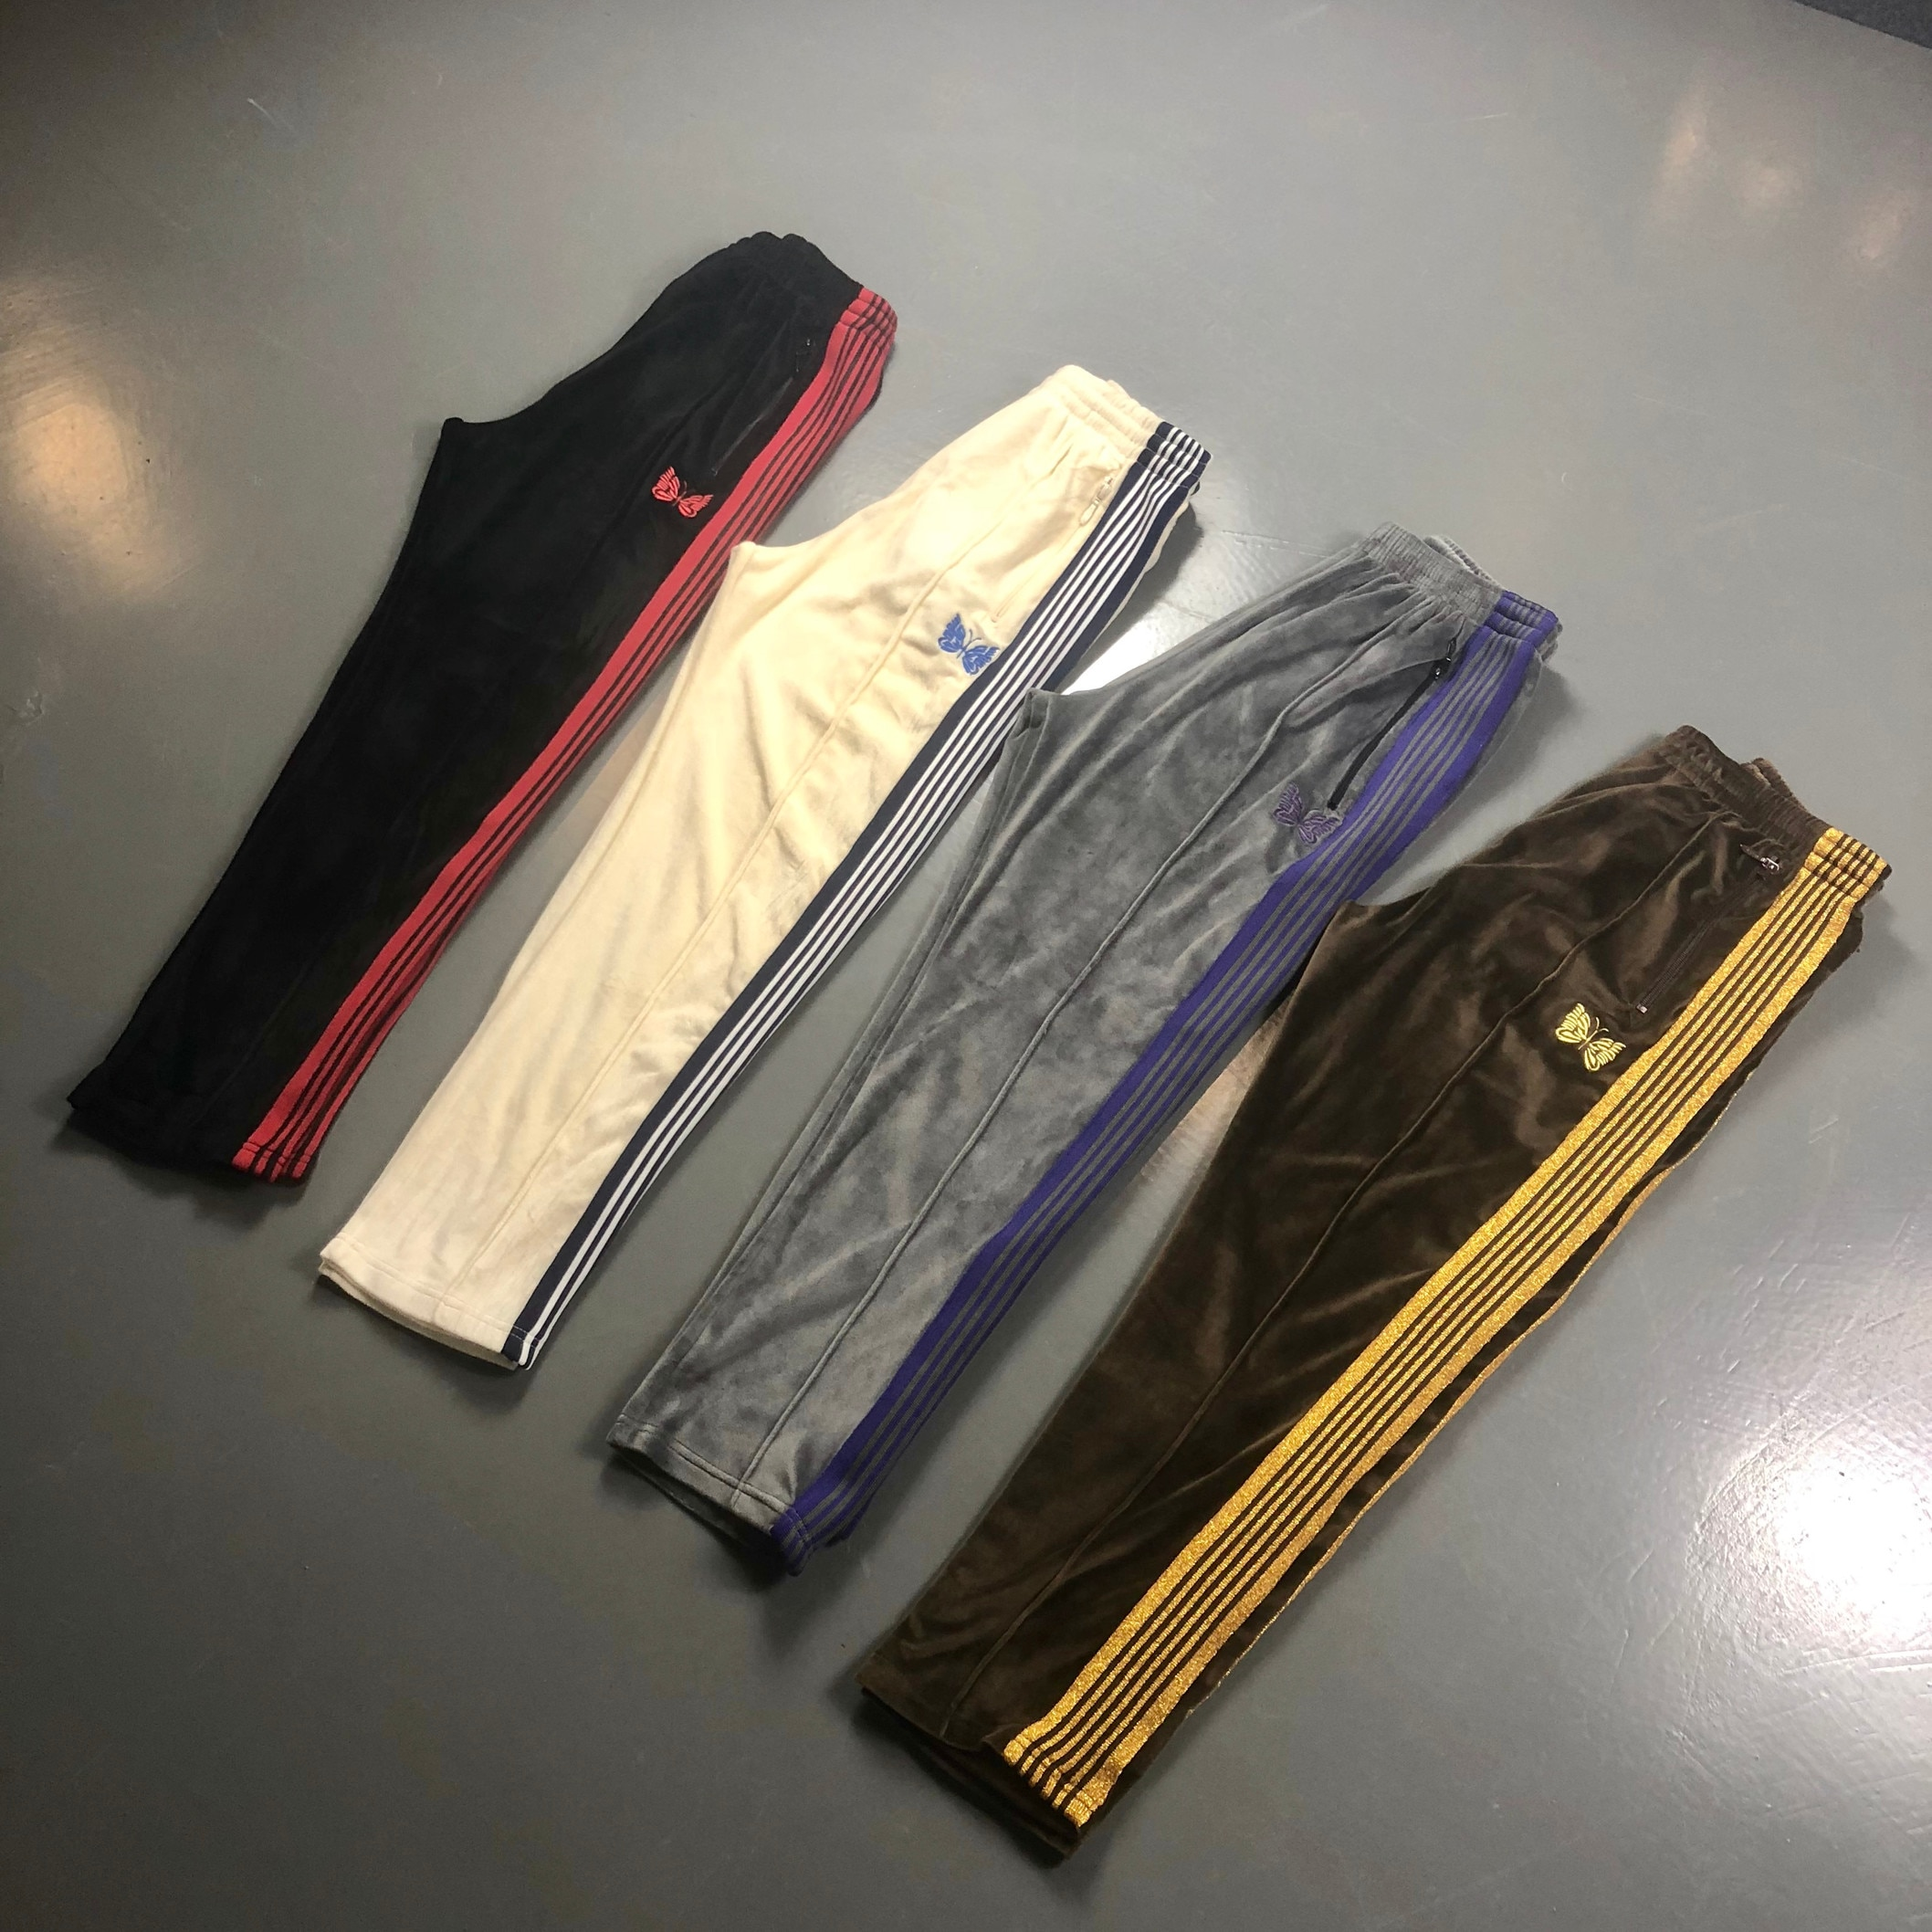 AWGE X Needles Pants Men Women Casual AWGE X Needles Sweatpants 19SS NARROW VELOUR Butterfly Embroidery Trousers